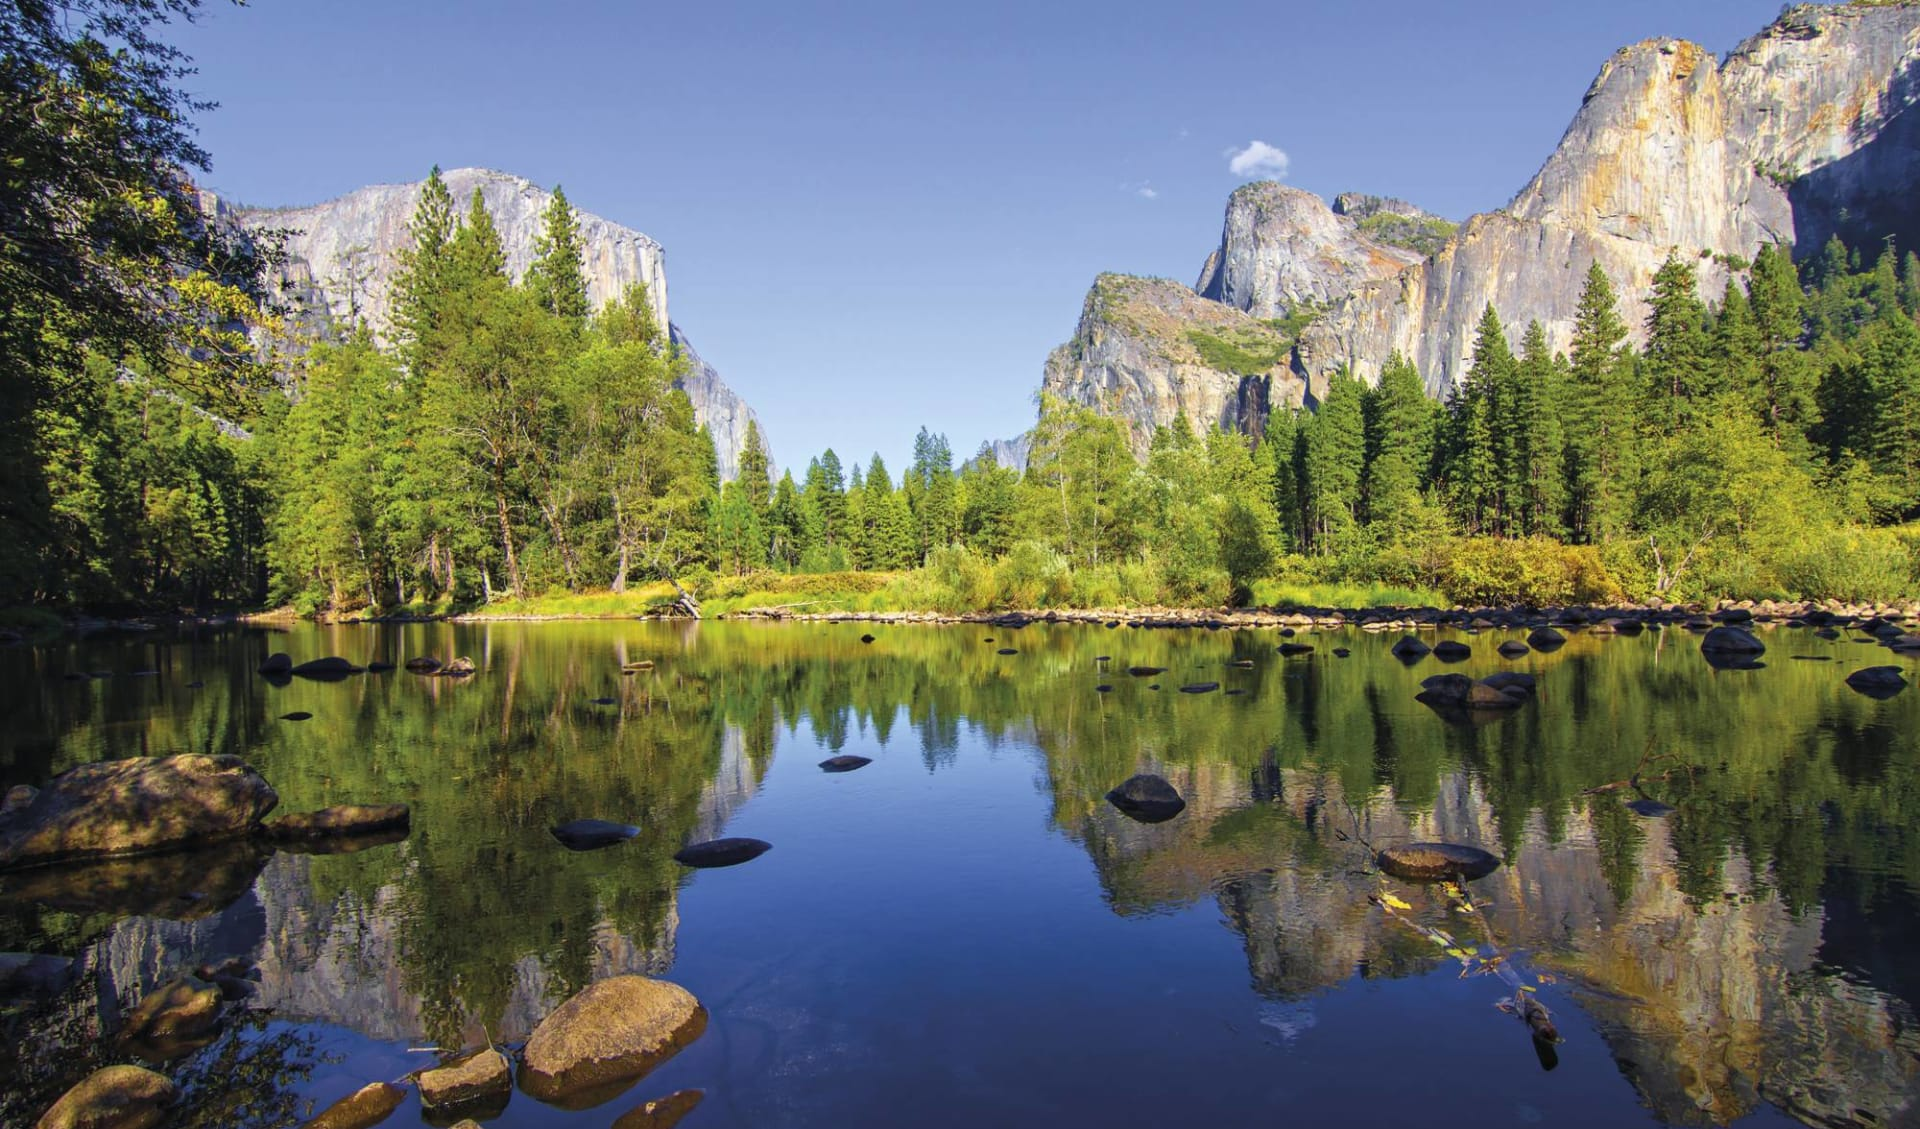 Impressionen des Westens ab San Francisco: USA - California - Yosemite Nationalpark